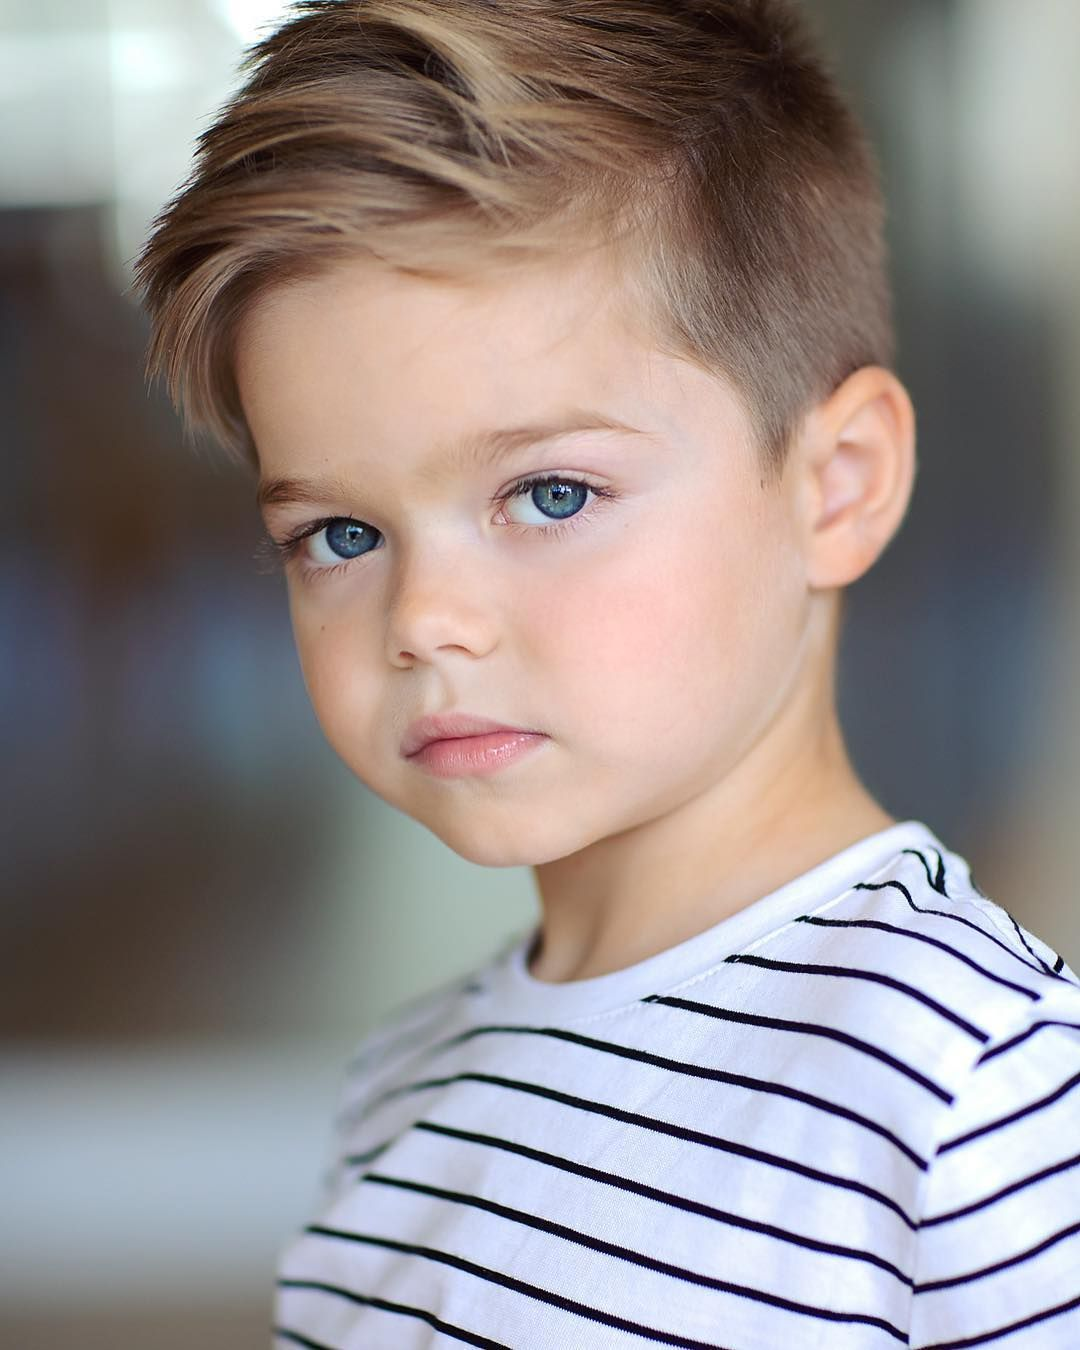 Sopo Family On Instagram Adorable Austin Shirt Beau Hudson Little Boy Haircuts Boy Haircuts Short Cool Boys Haircuts